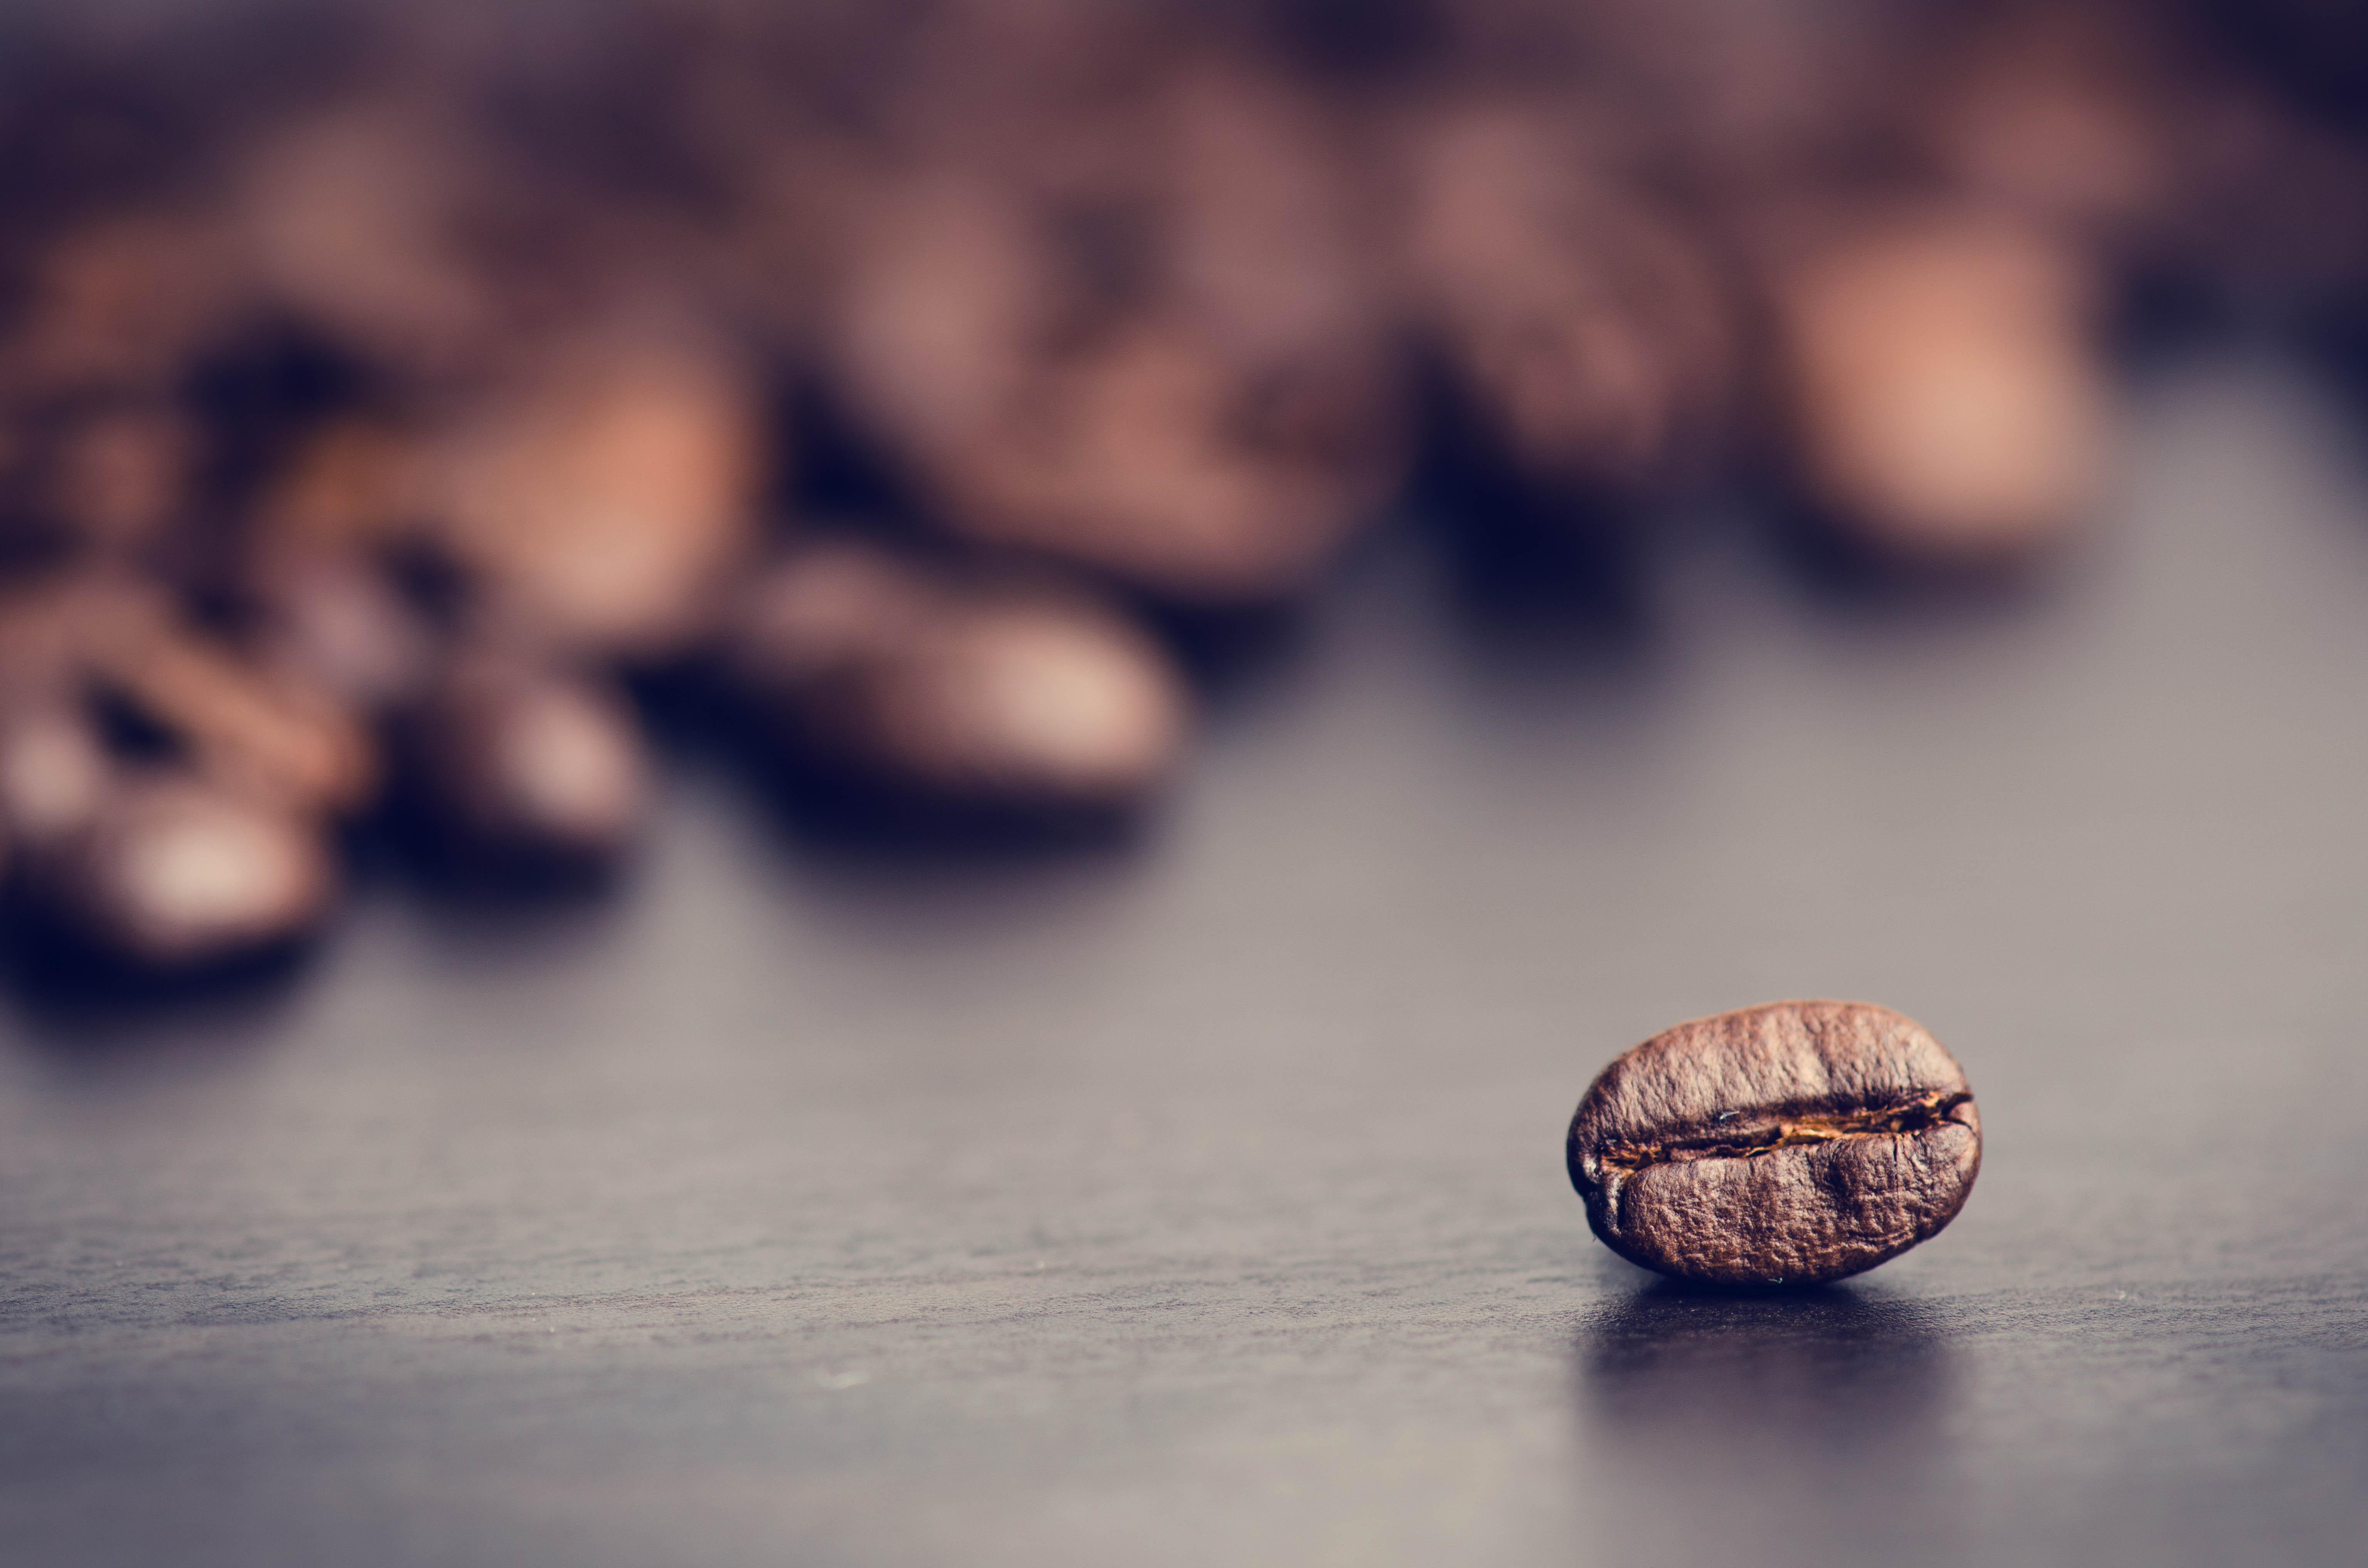 Coffee bean large